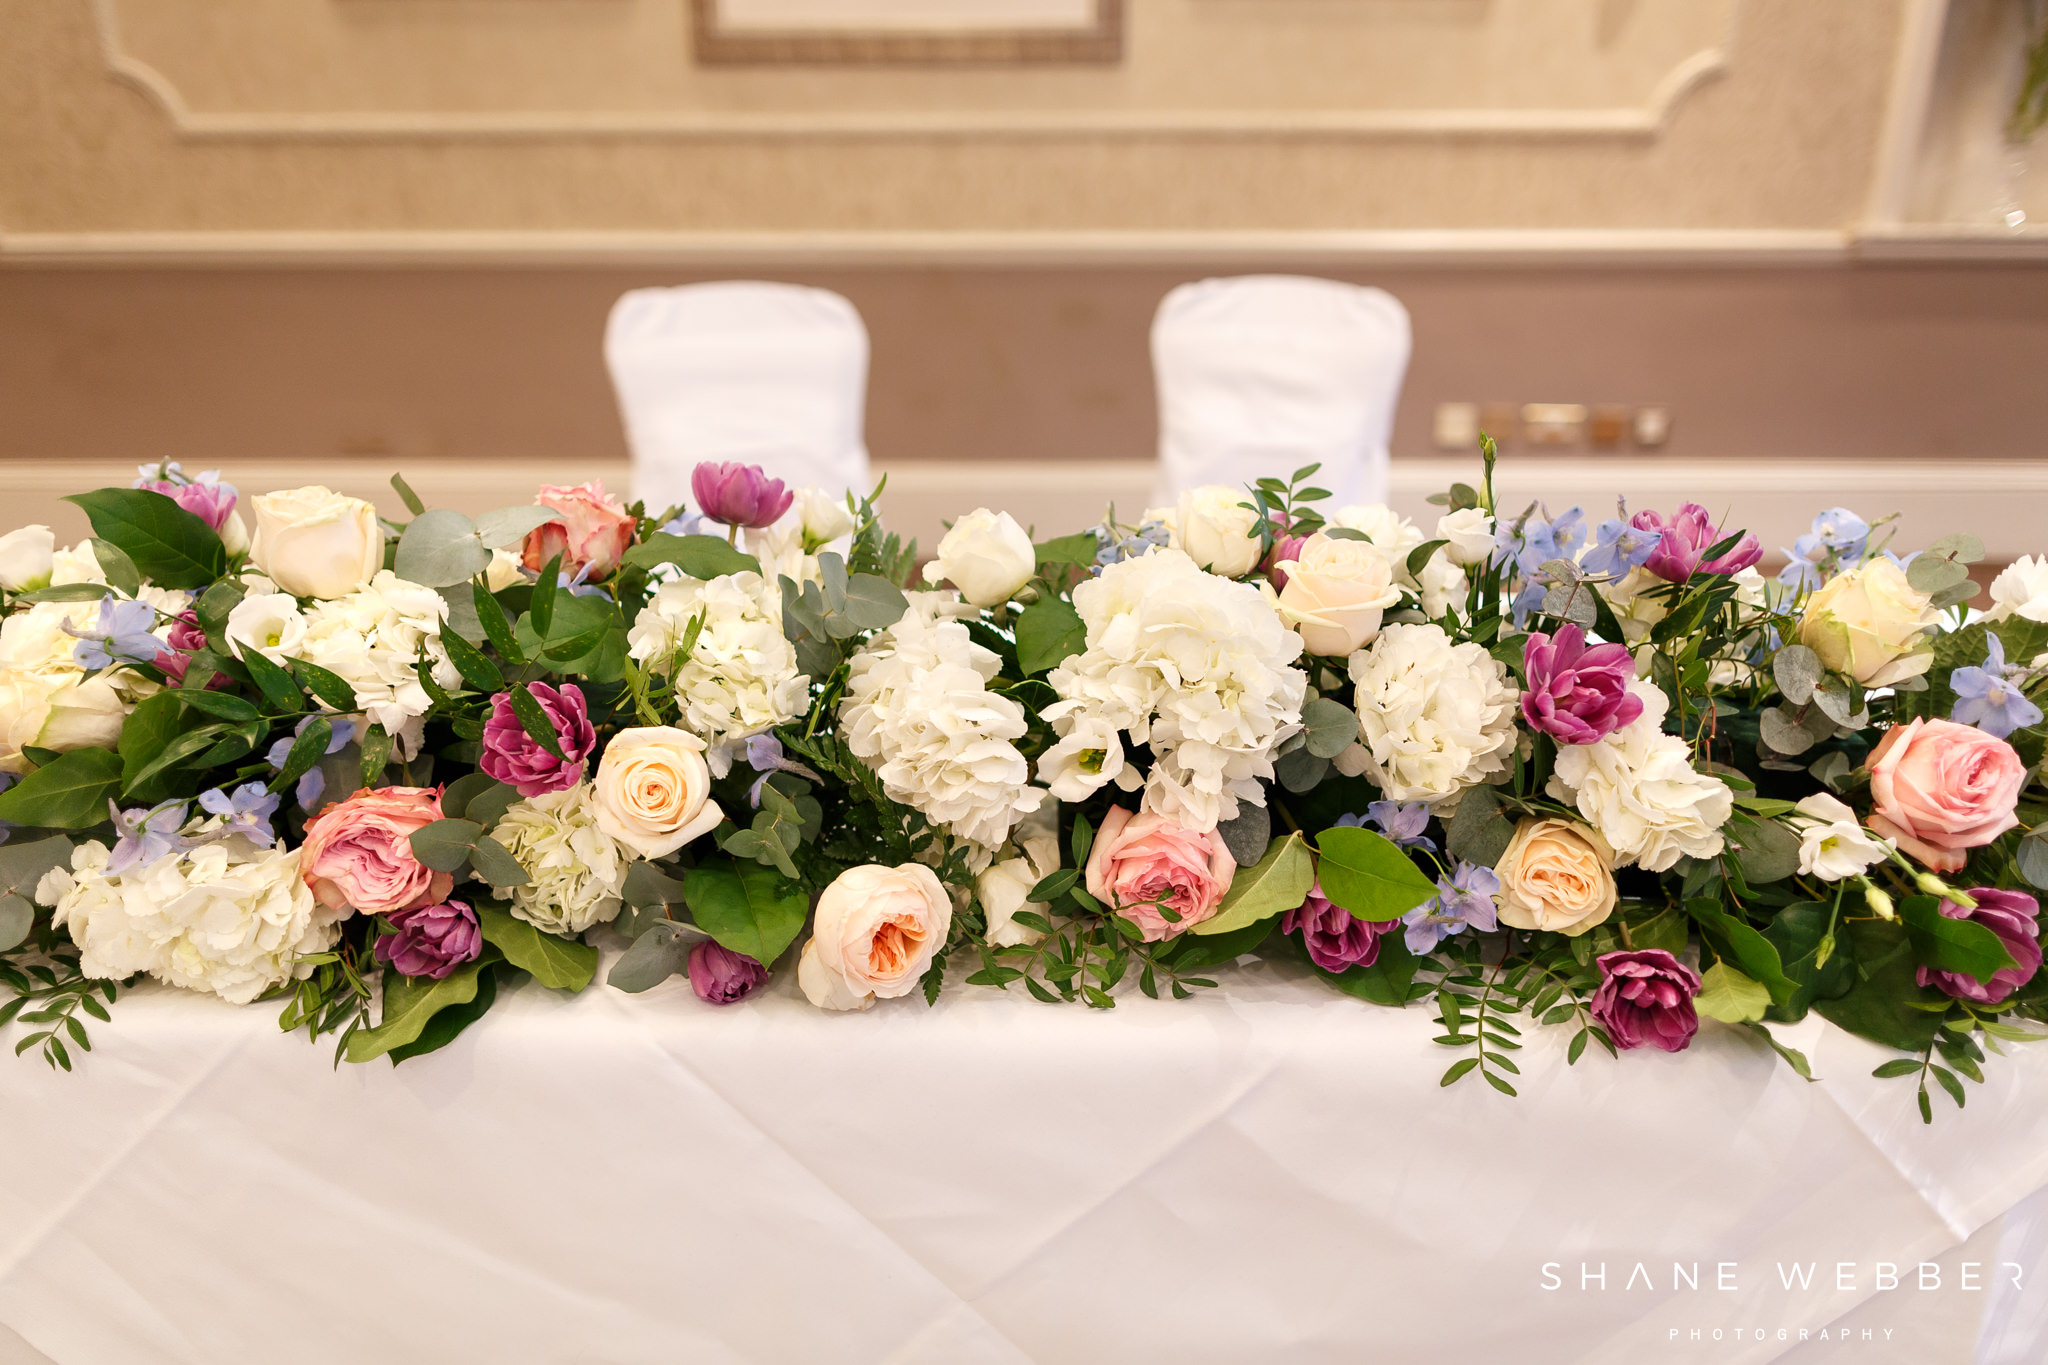 Top table arrangement florist in harrogate